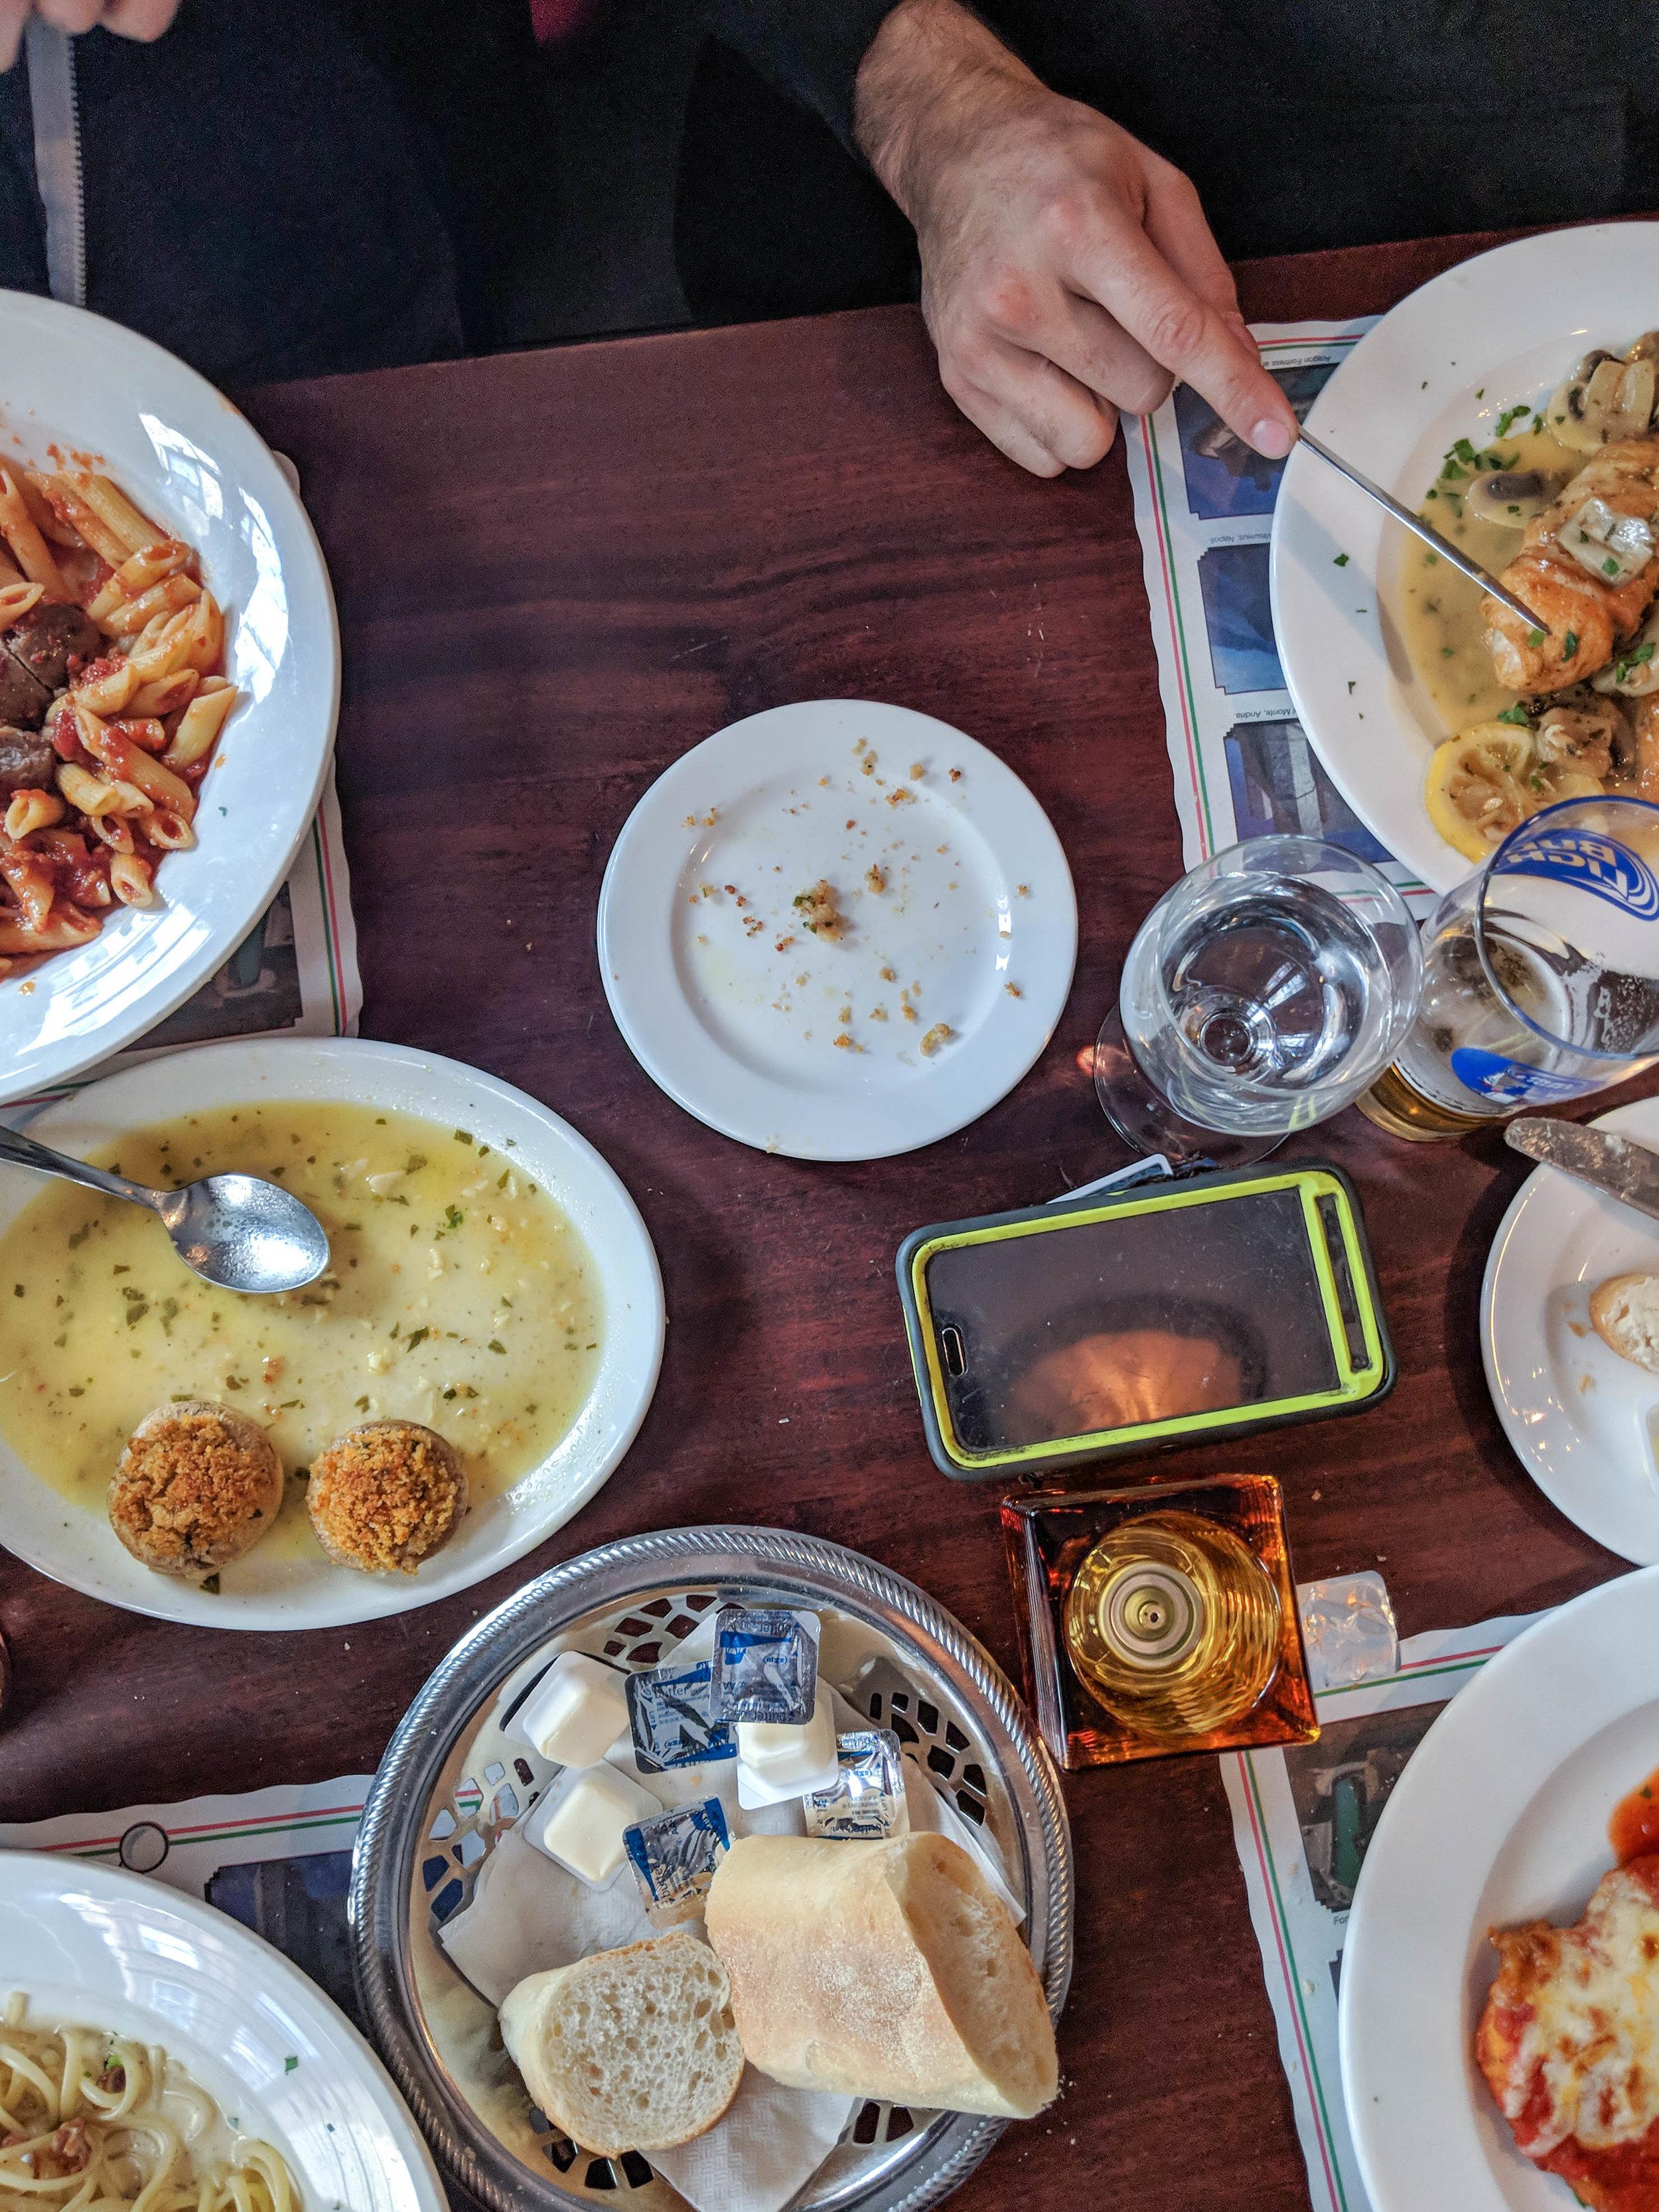 bri rinehart; photography; l'osteria; north end; boston; food